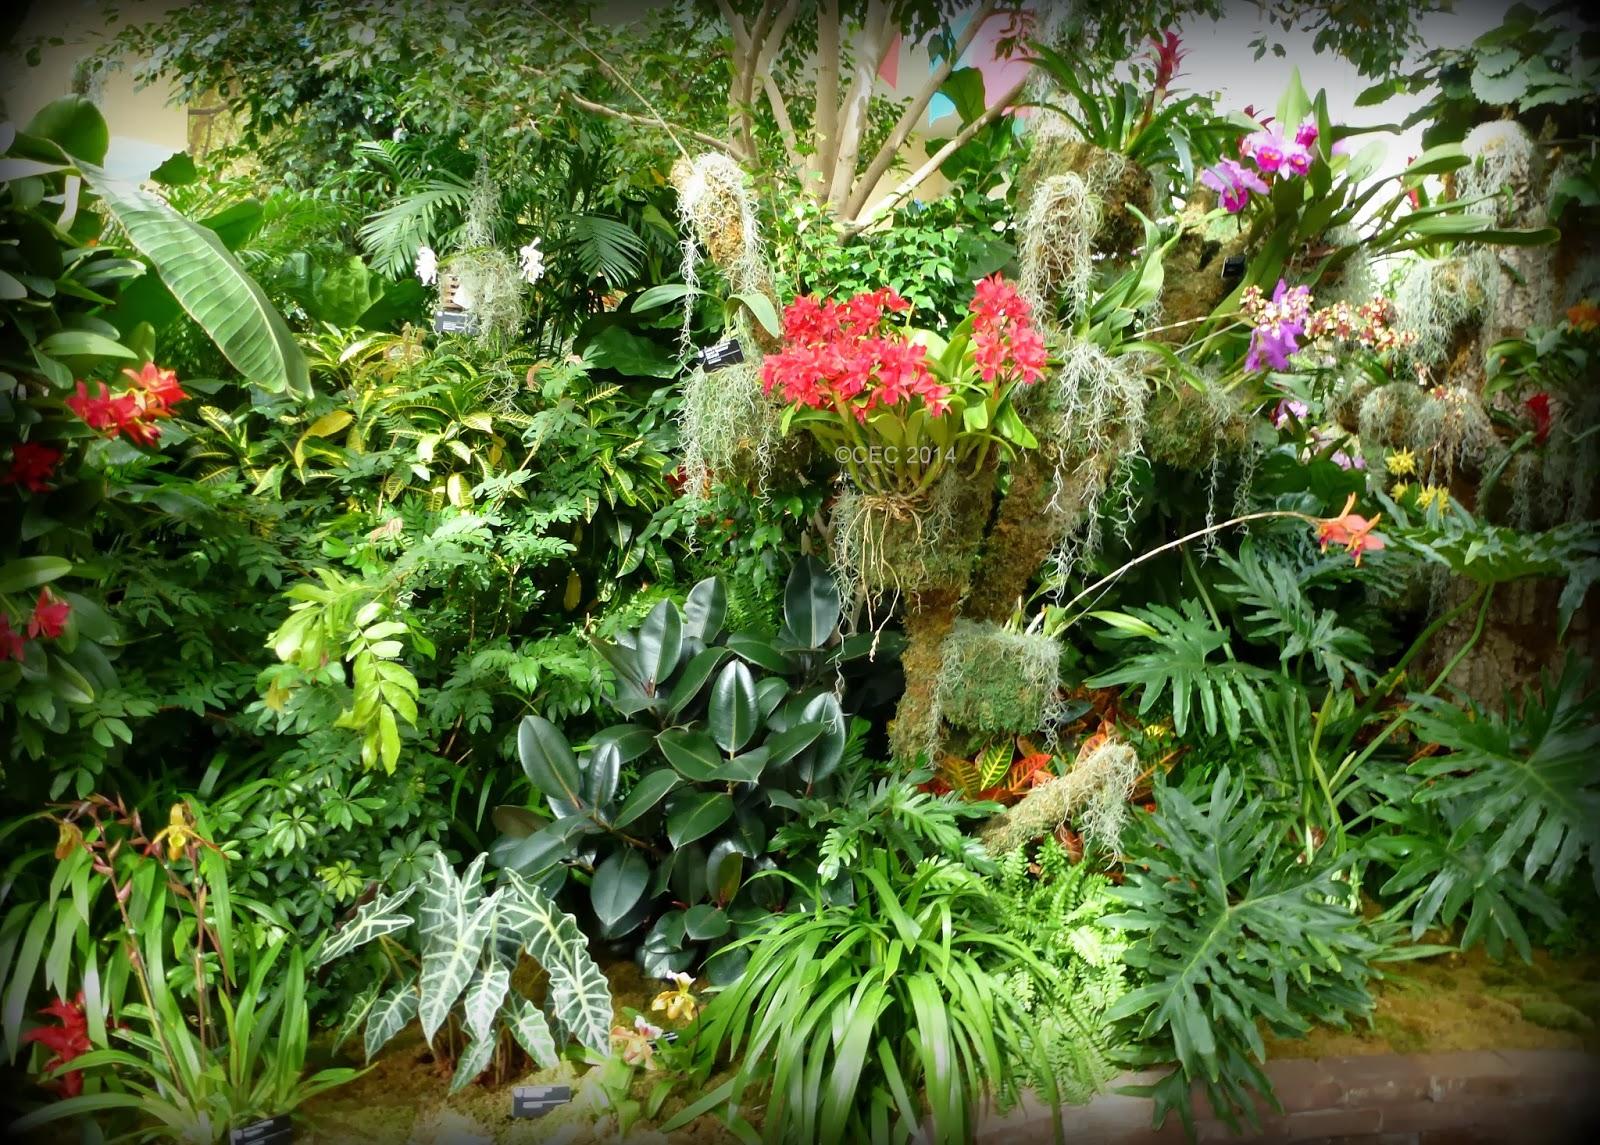 burke u0027s backyard dennis hundscheidt u0027s garden youtube for my